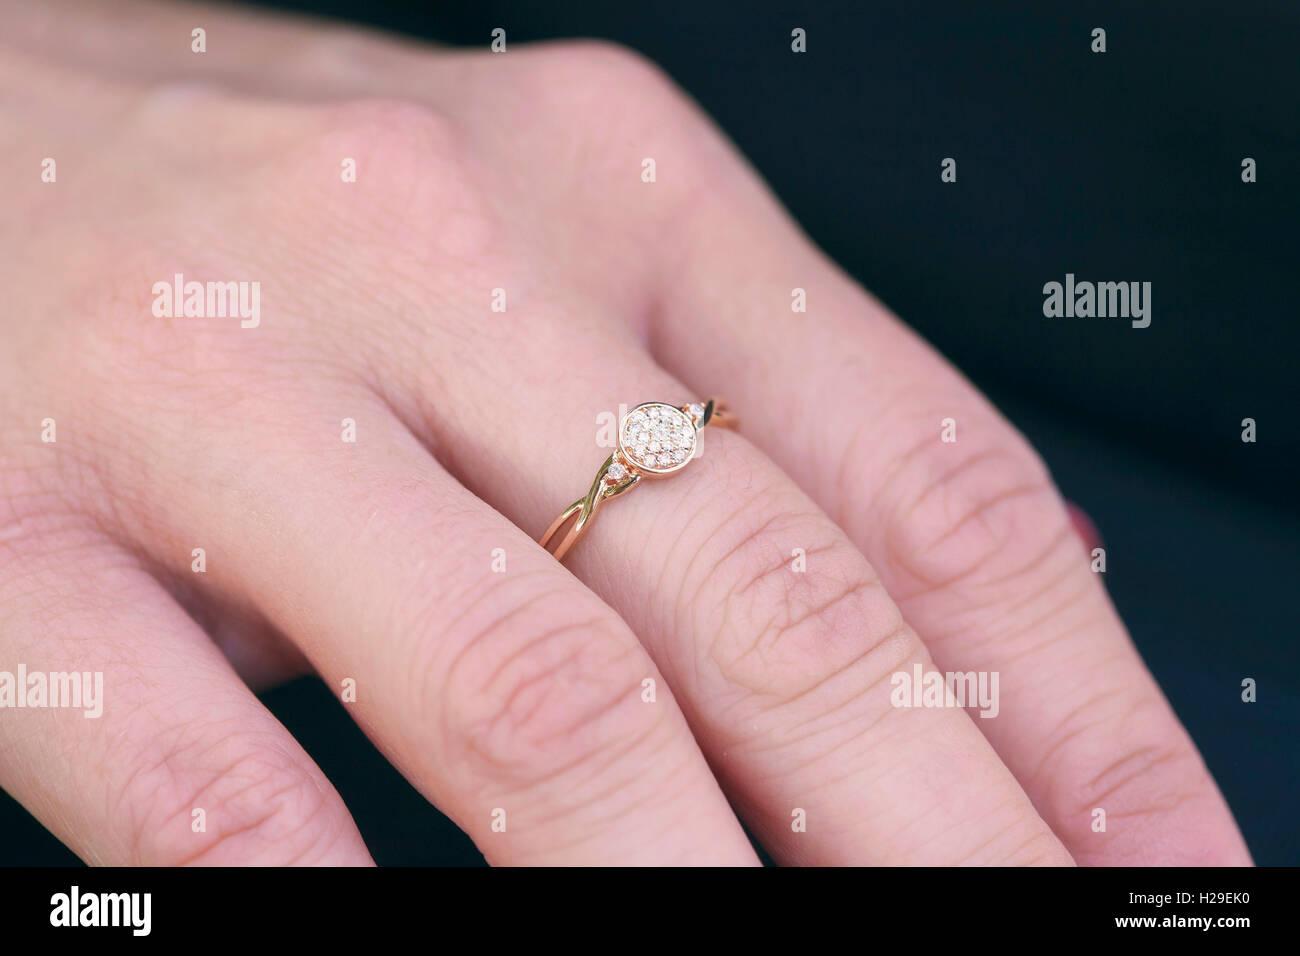 Diamond Engagement Ring On Black Background Stock Photos & Diamond ...